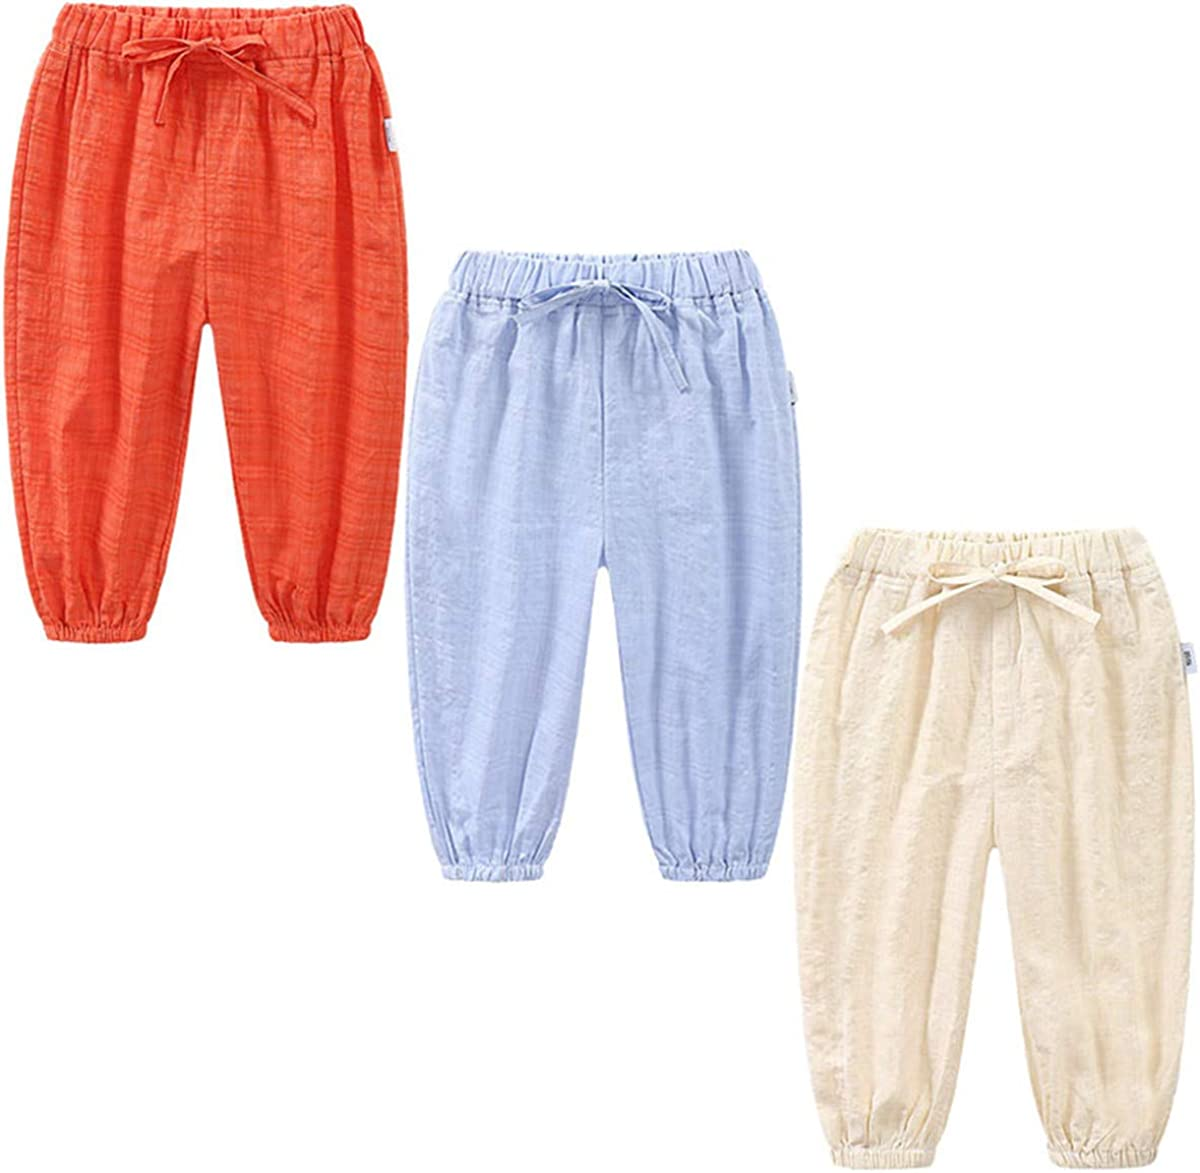 3 Pack of Kinder M/ädchen Jungen Sommer Baumwoll Drucken Leinenhose Pumphose Elastische L/ässige Anti-Moskito Jogginghose L/ässige Pants Hose